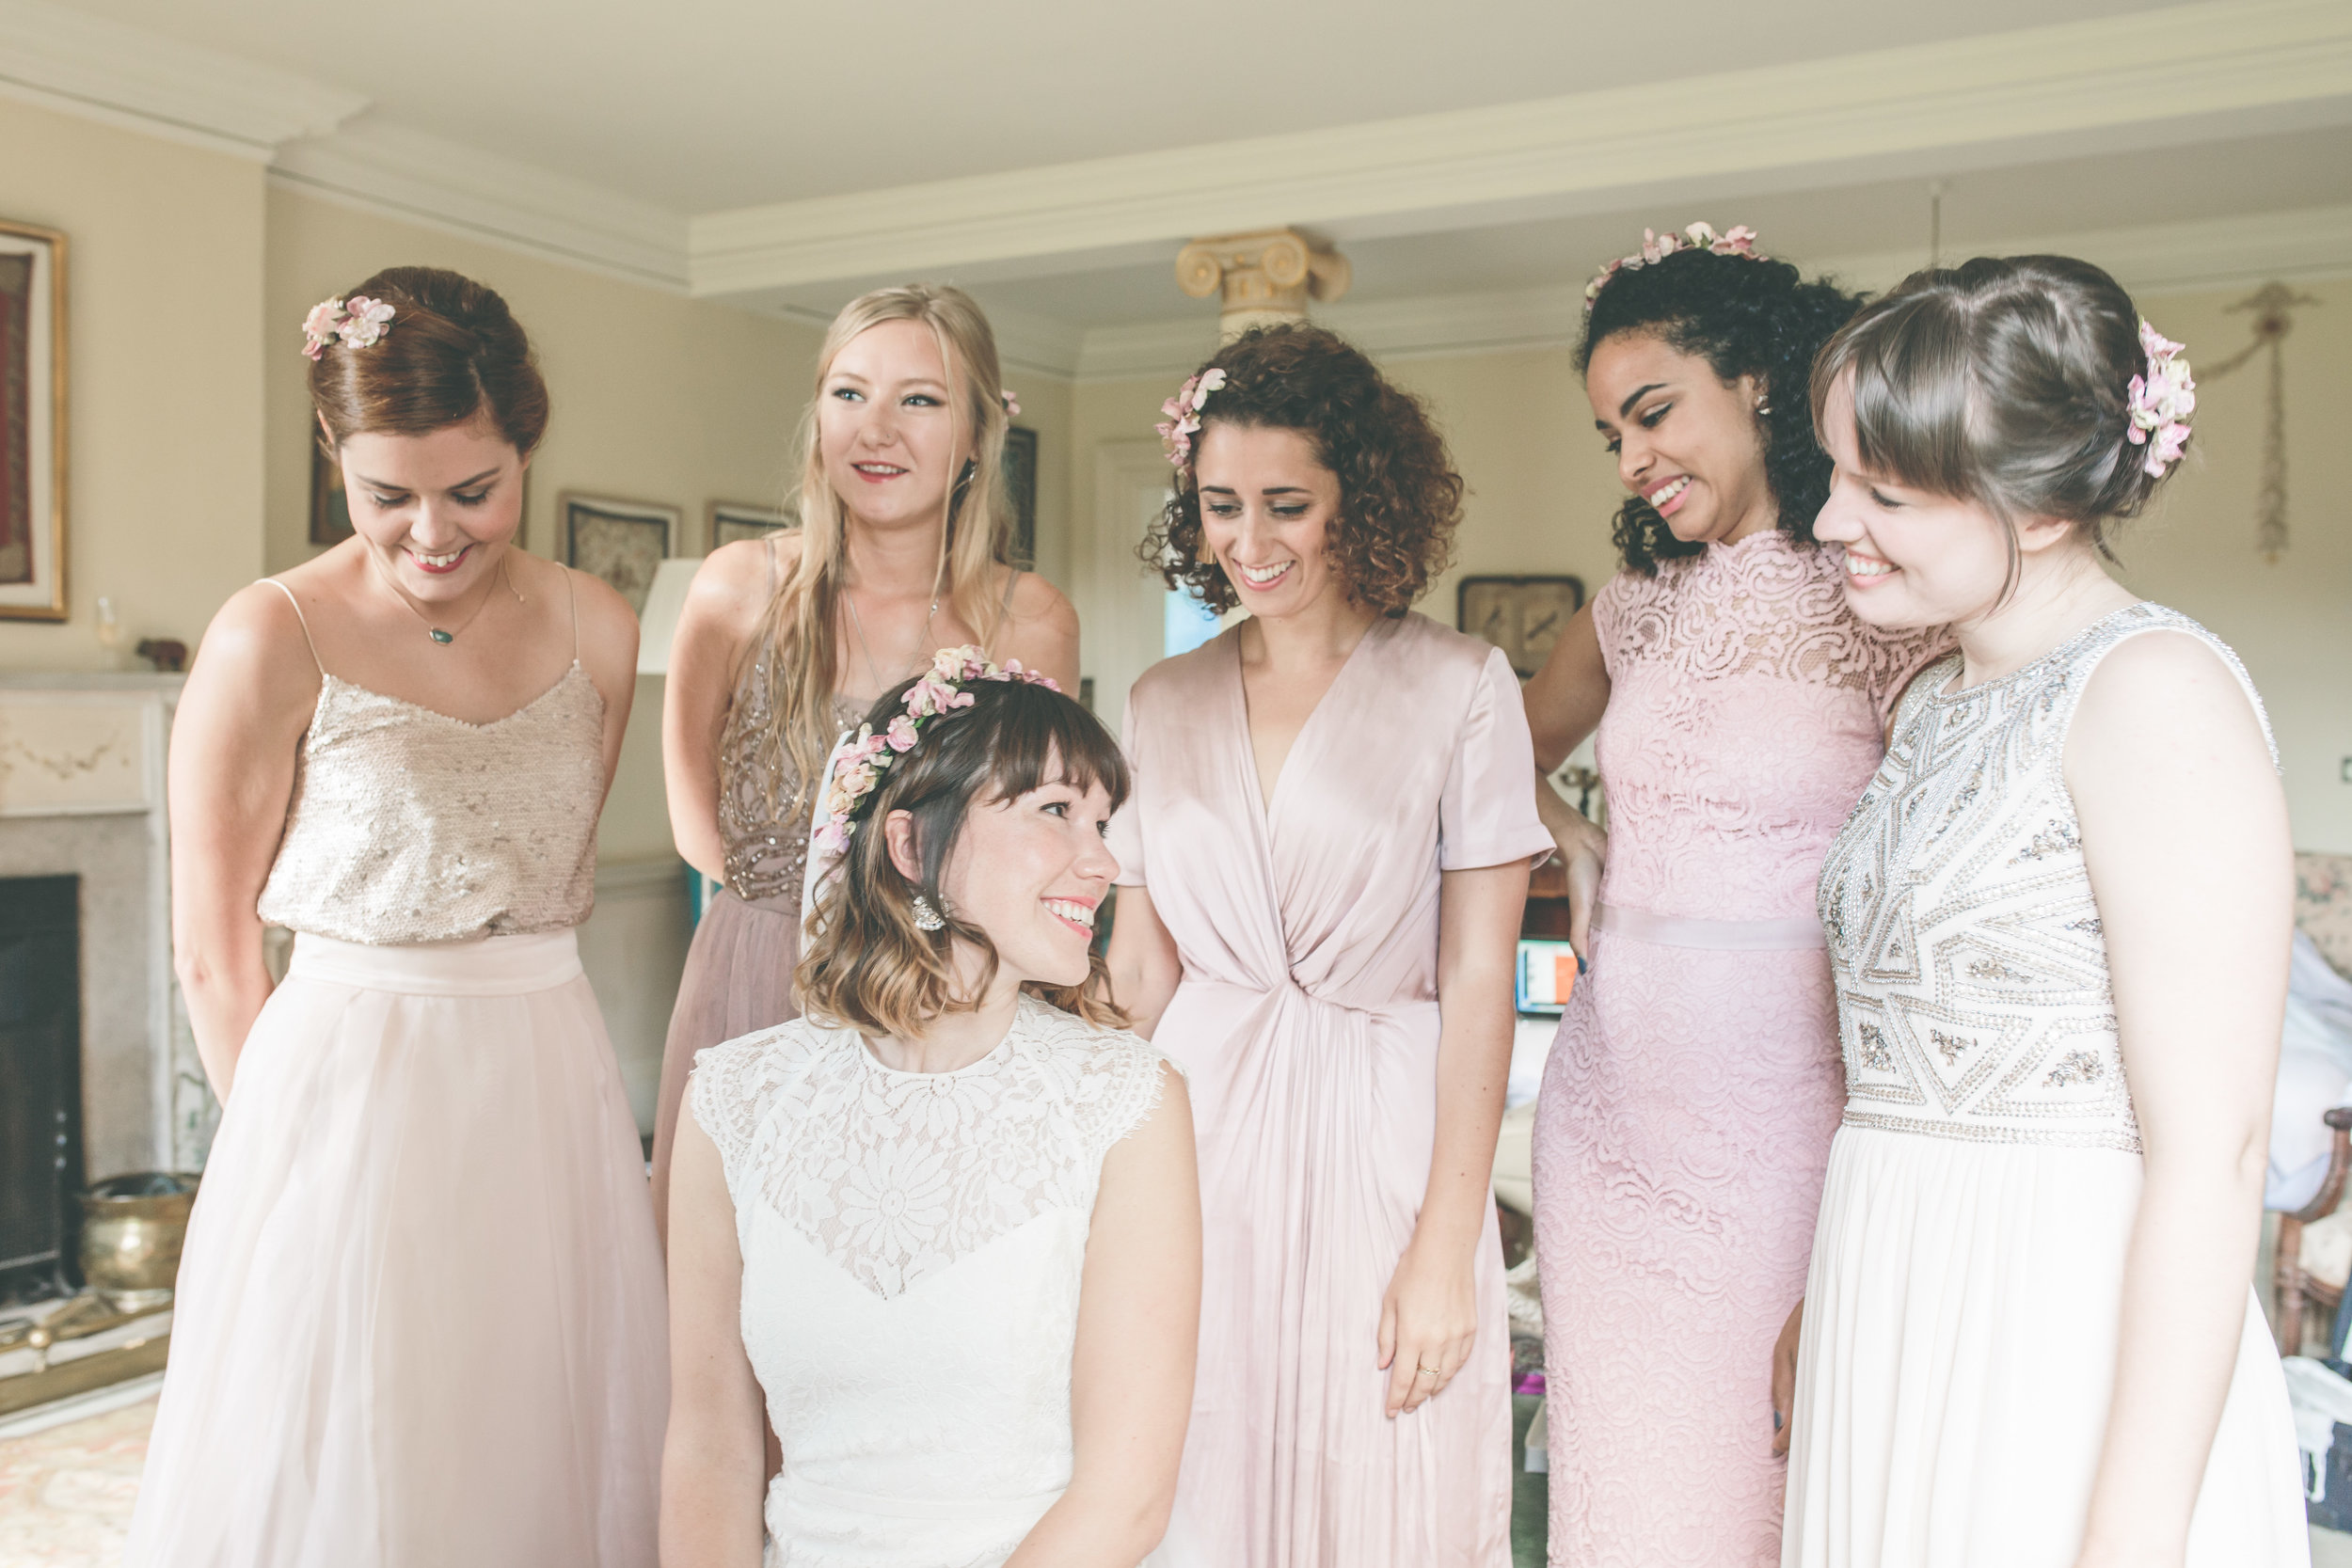 Walcot Hall Wedding Photography - Bride and Bridesmaids